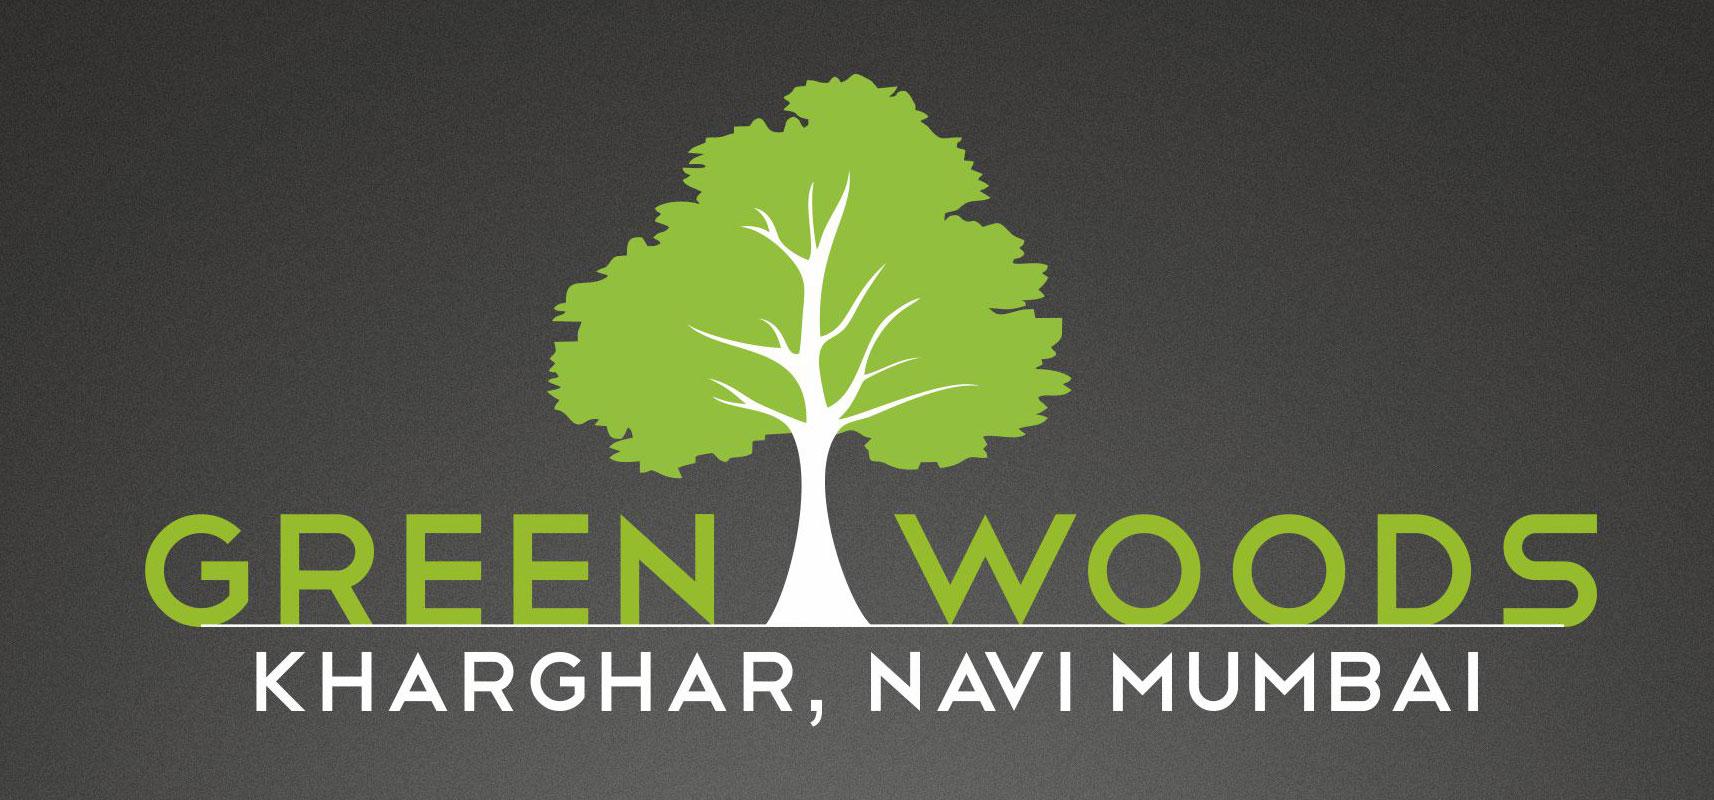 LOGO - Greenwoods